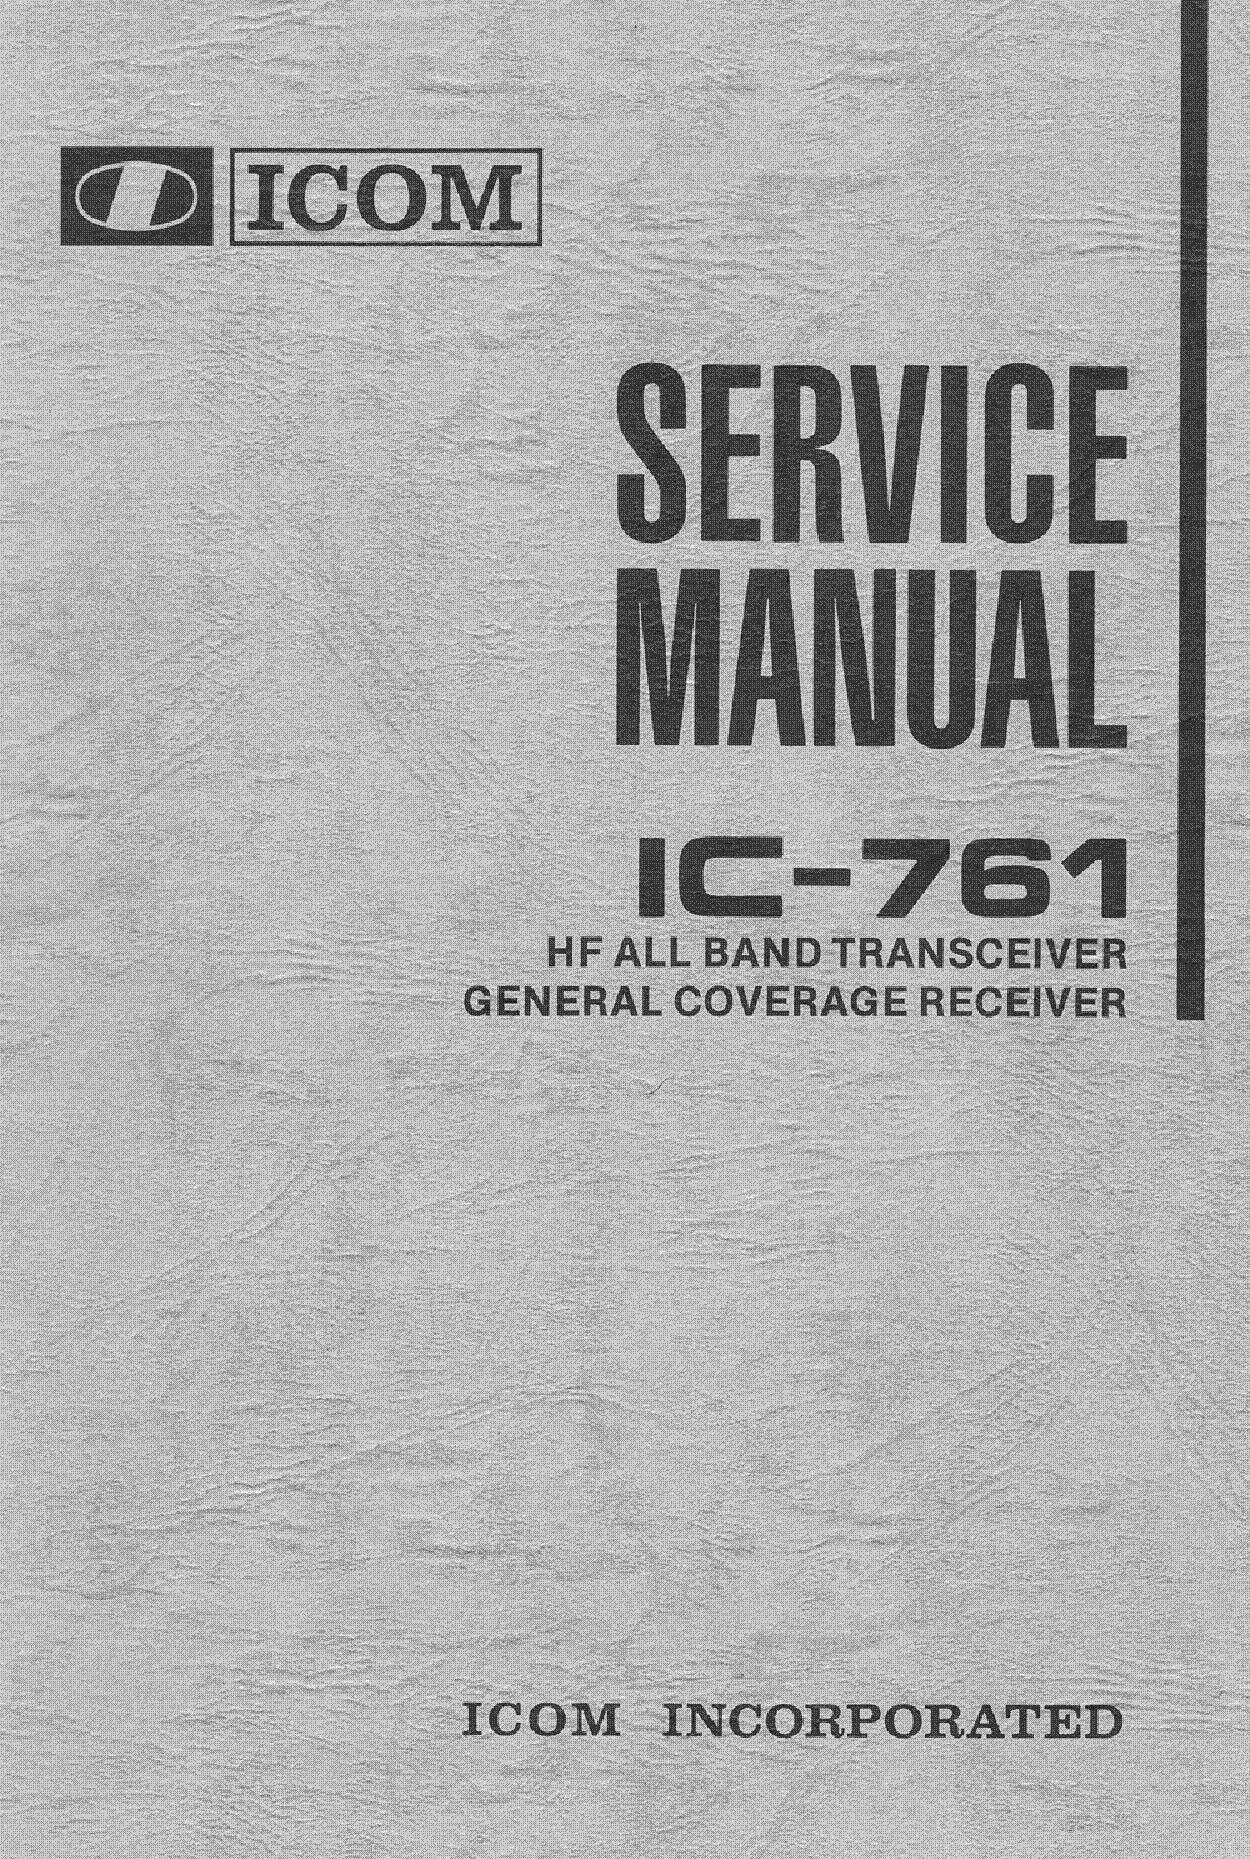 ICOM IC-761 SERVICE MANUAL